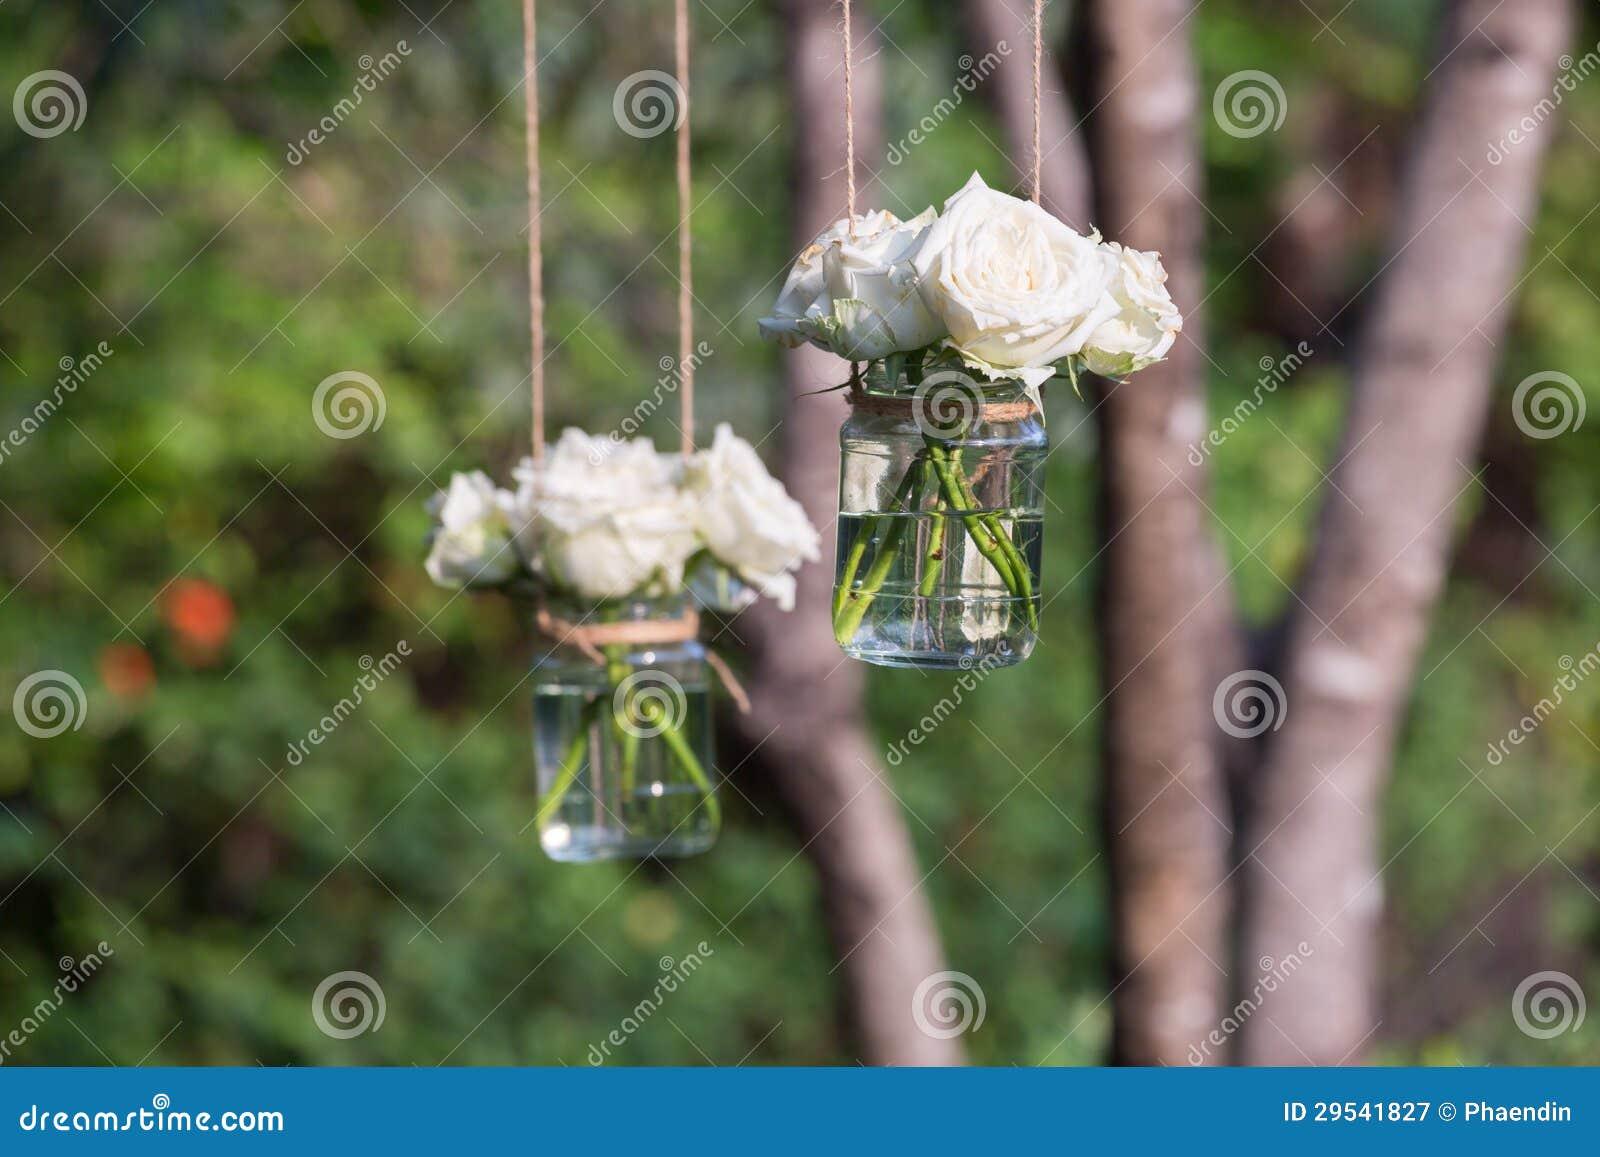 Vitro i en glass vase